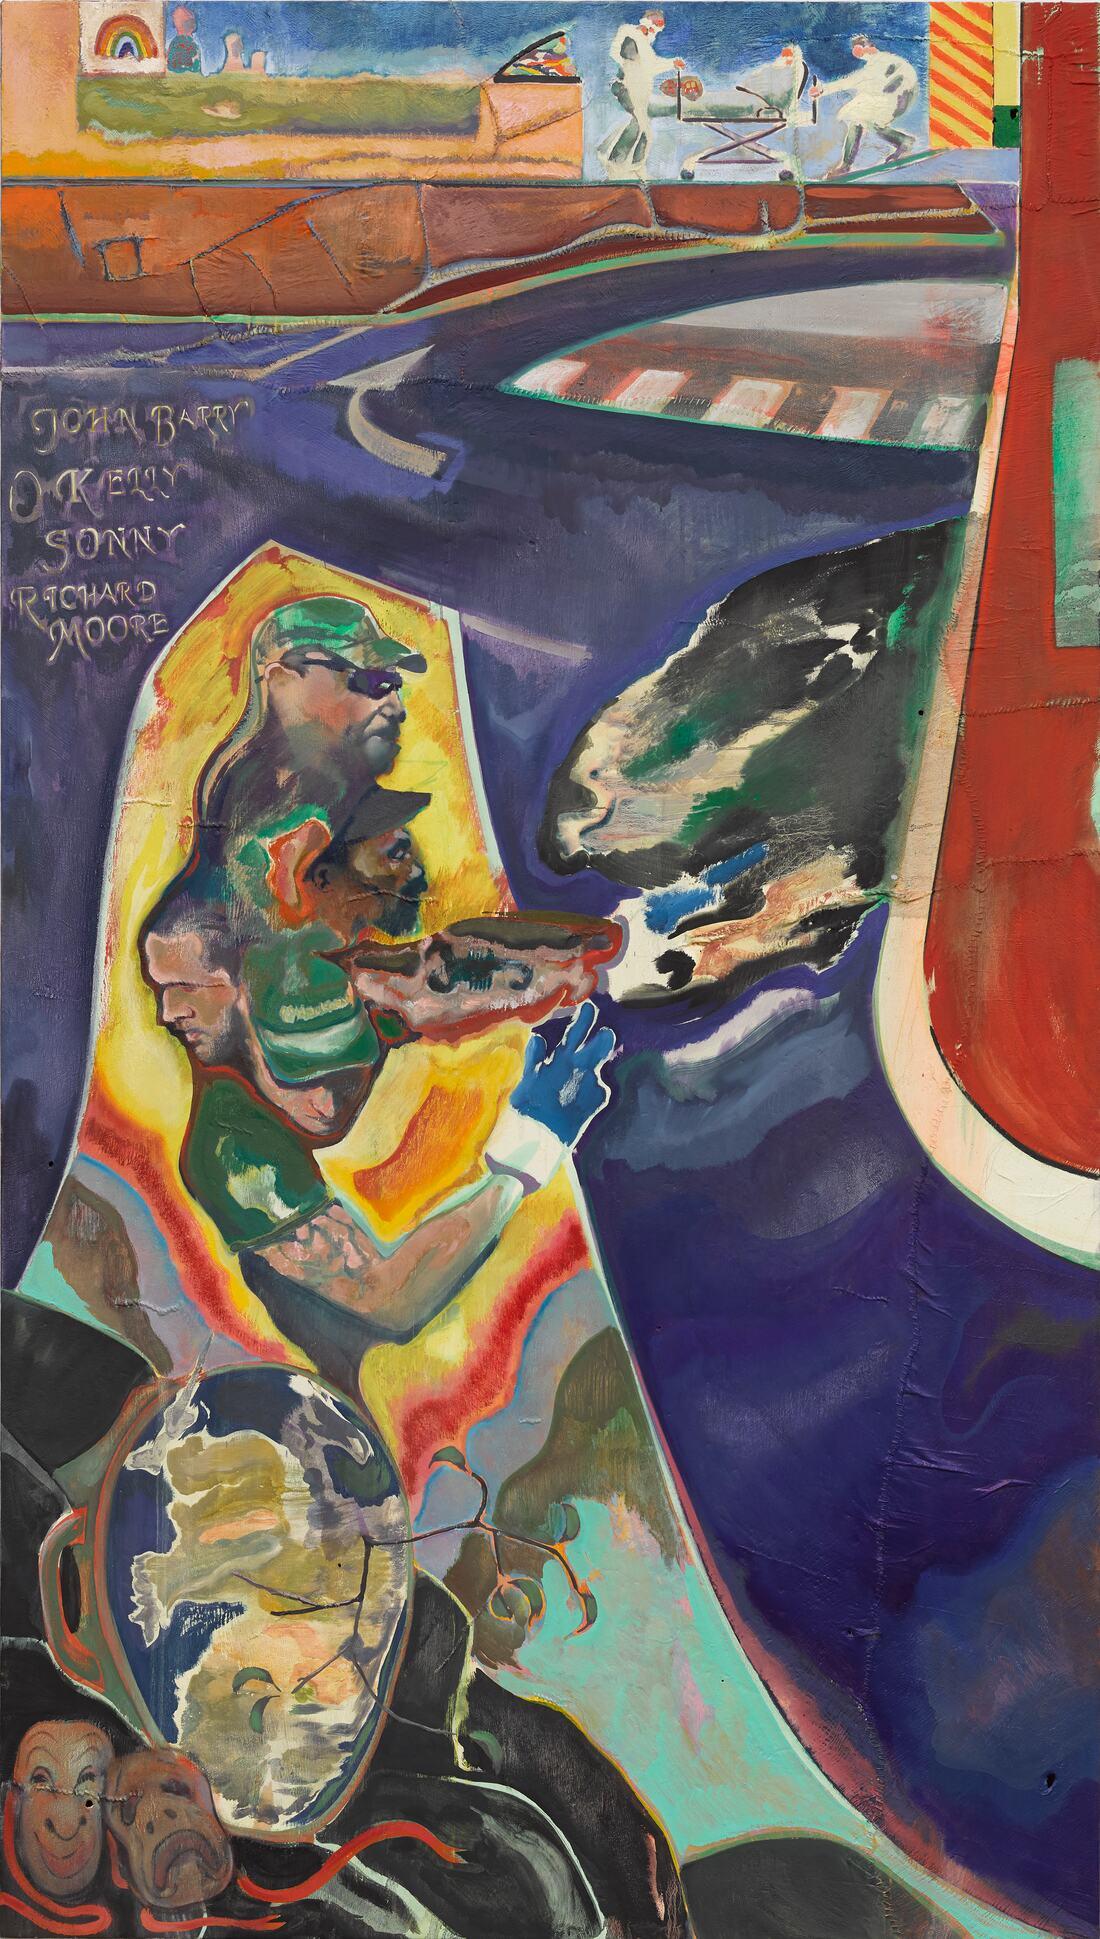 Everyday Heroes: Michael Armitage, John Barry, O Kelly, Sonny and Richard Moore, 2020. Oil on Lubugo bark cloth. Copyright the artist.